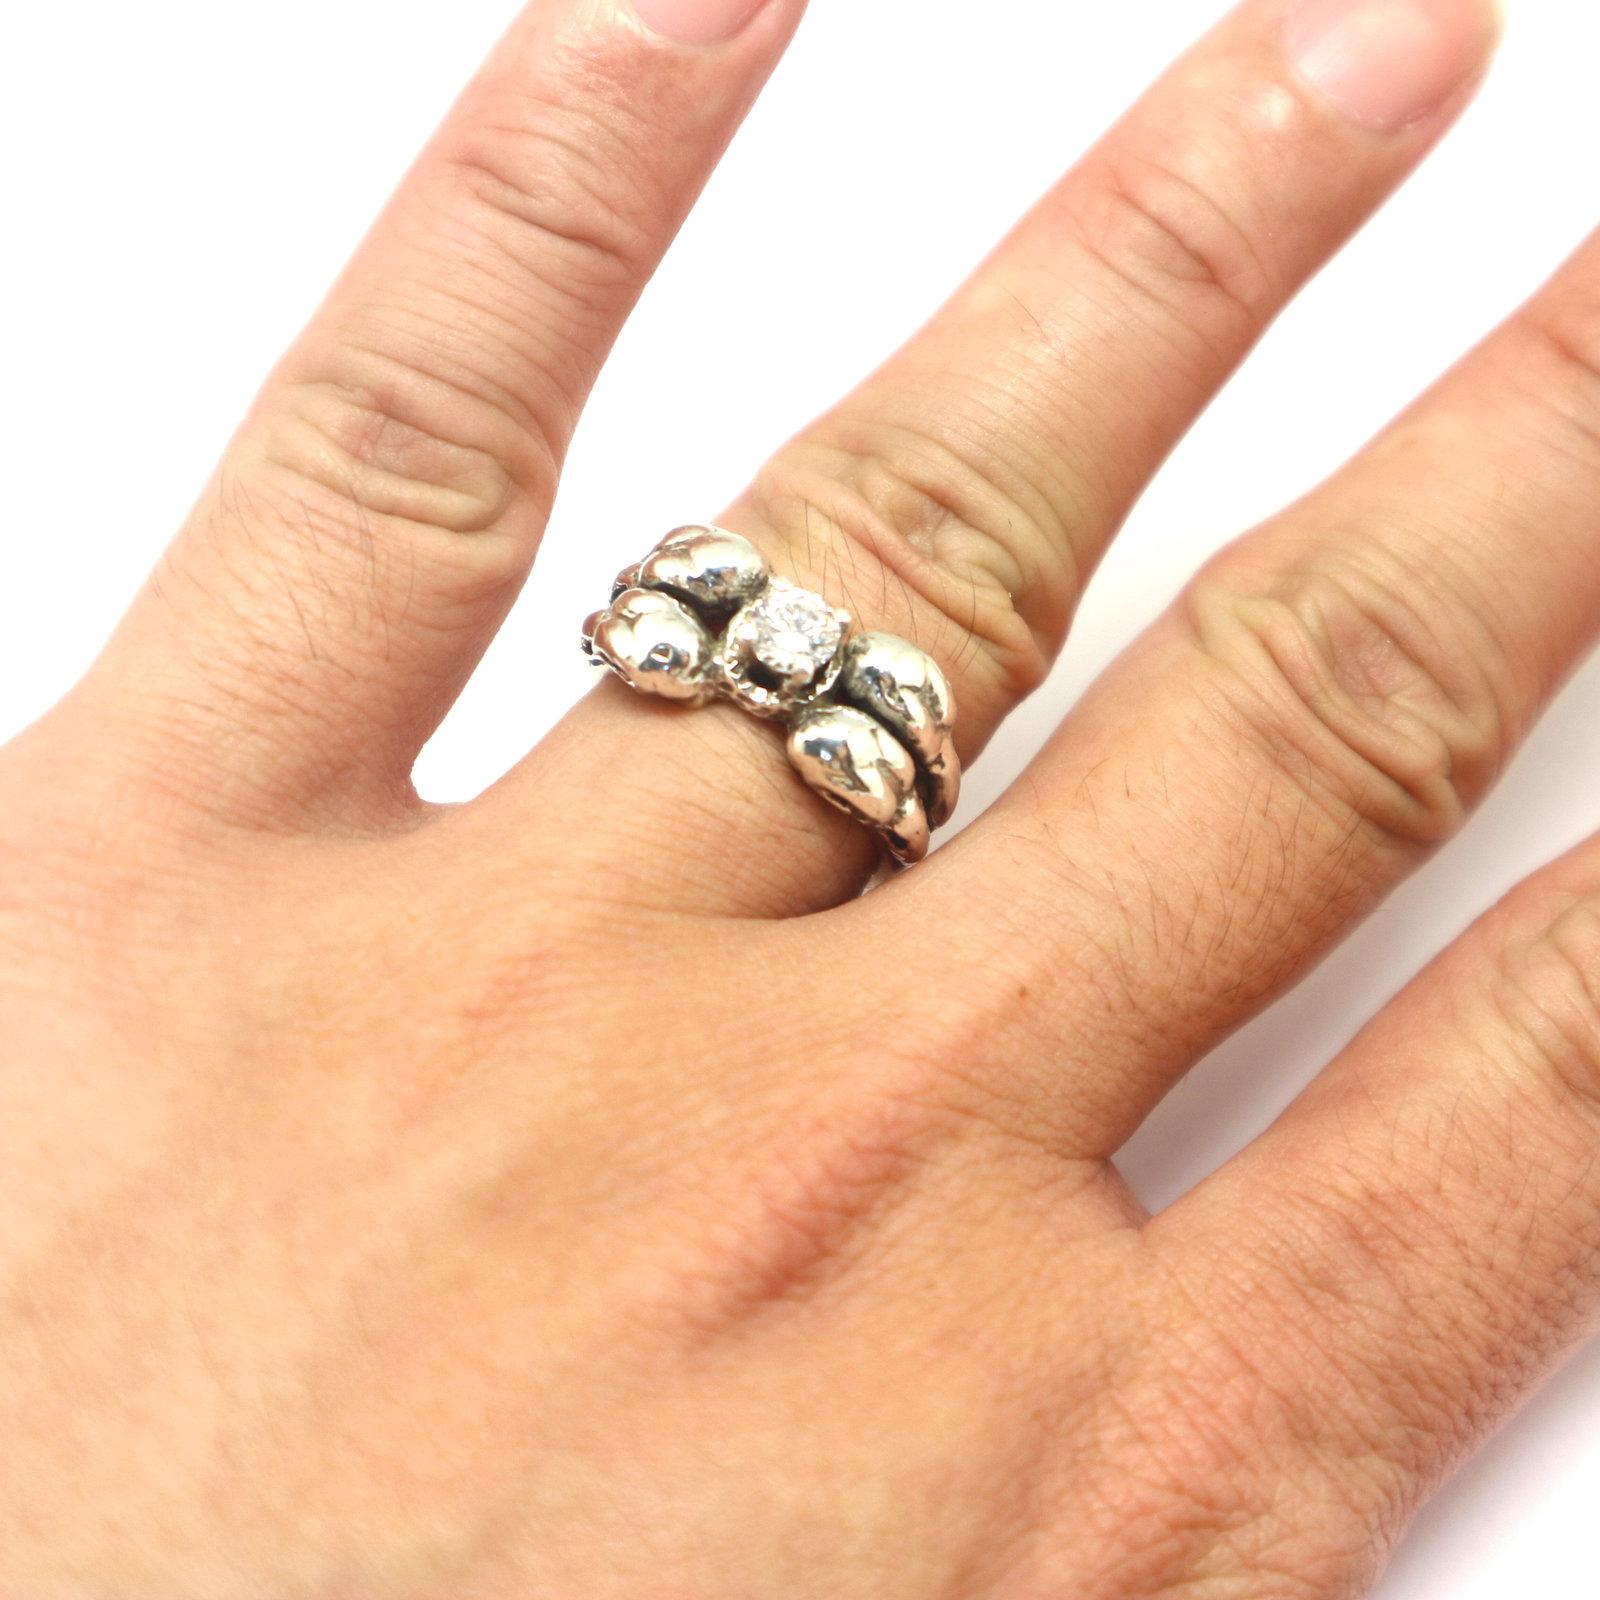 Silver Raven Skull Ring image 4